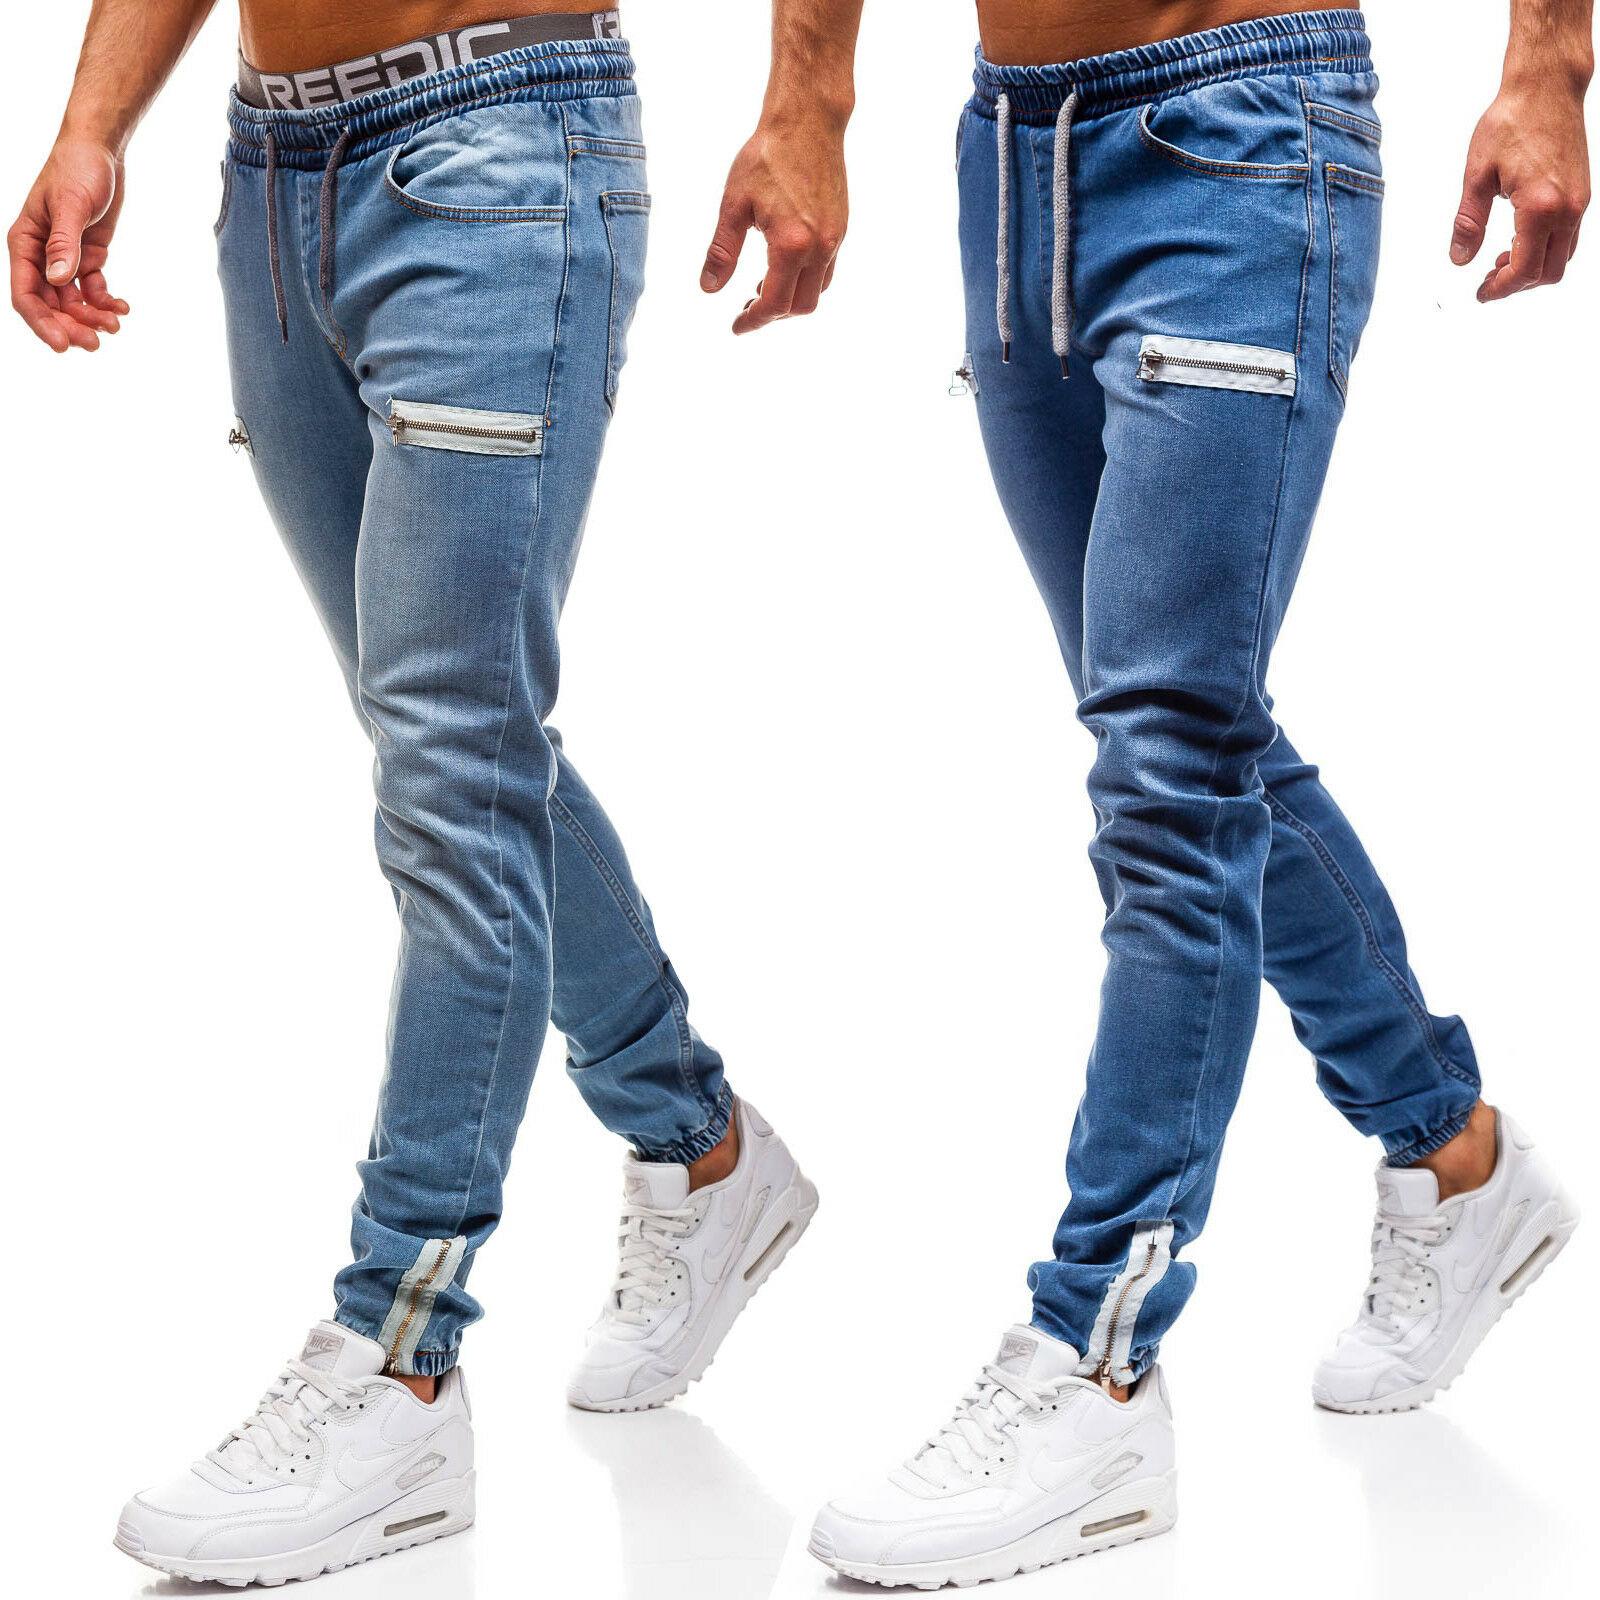 3 Styles Men Stretchy Ripped Skinny Biker Jeans BIack Zip Pocket Taped Slim Fit Denim Scratched High Quality Jean